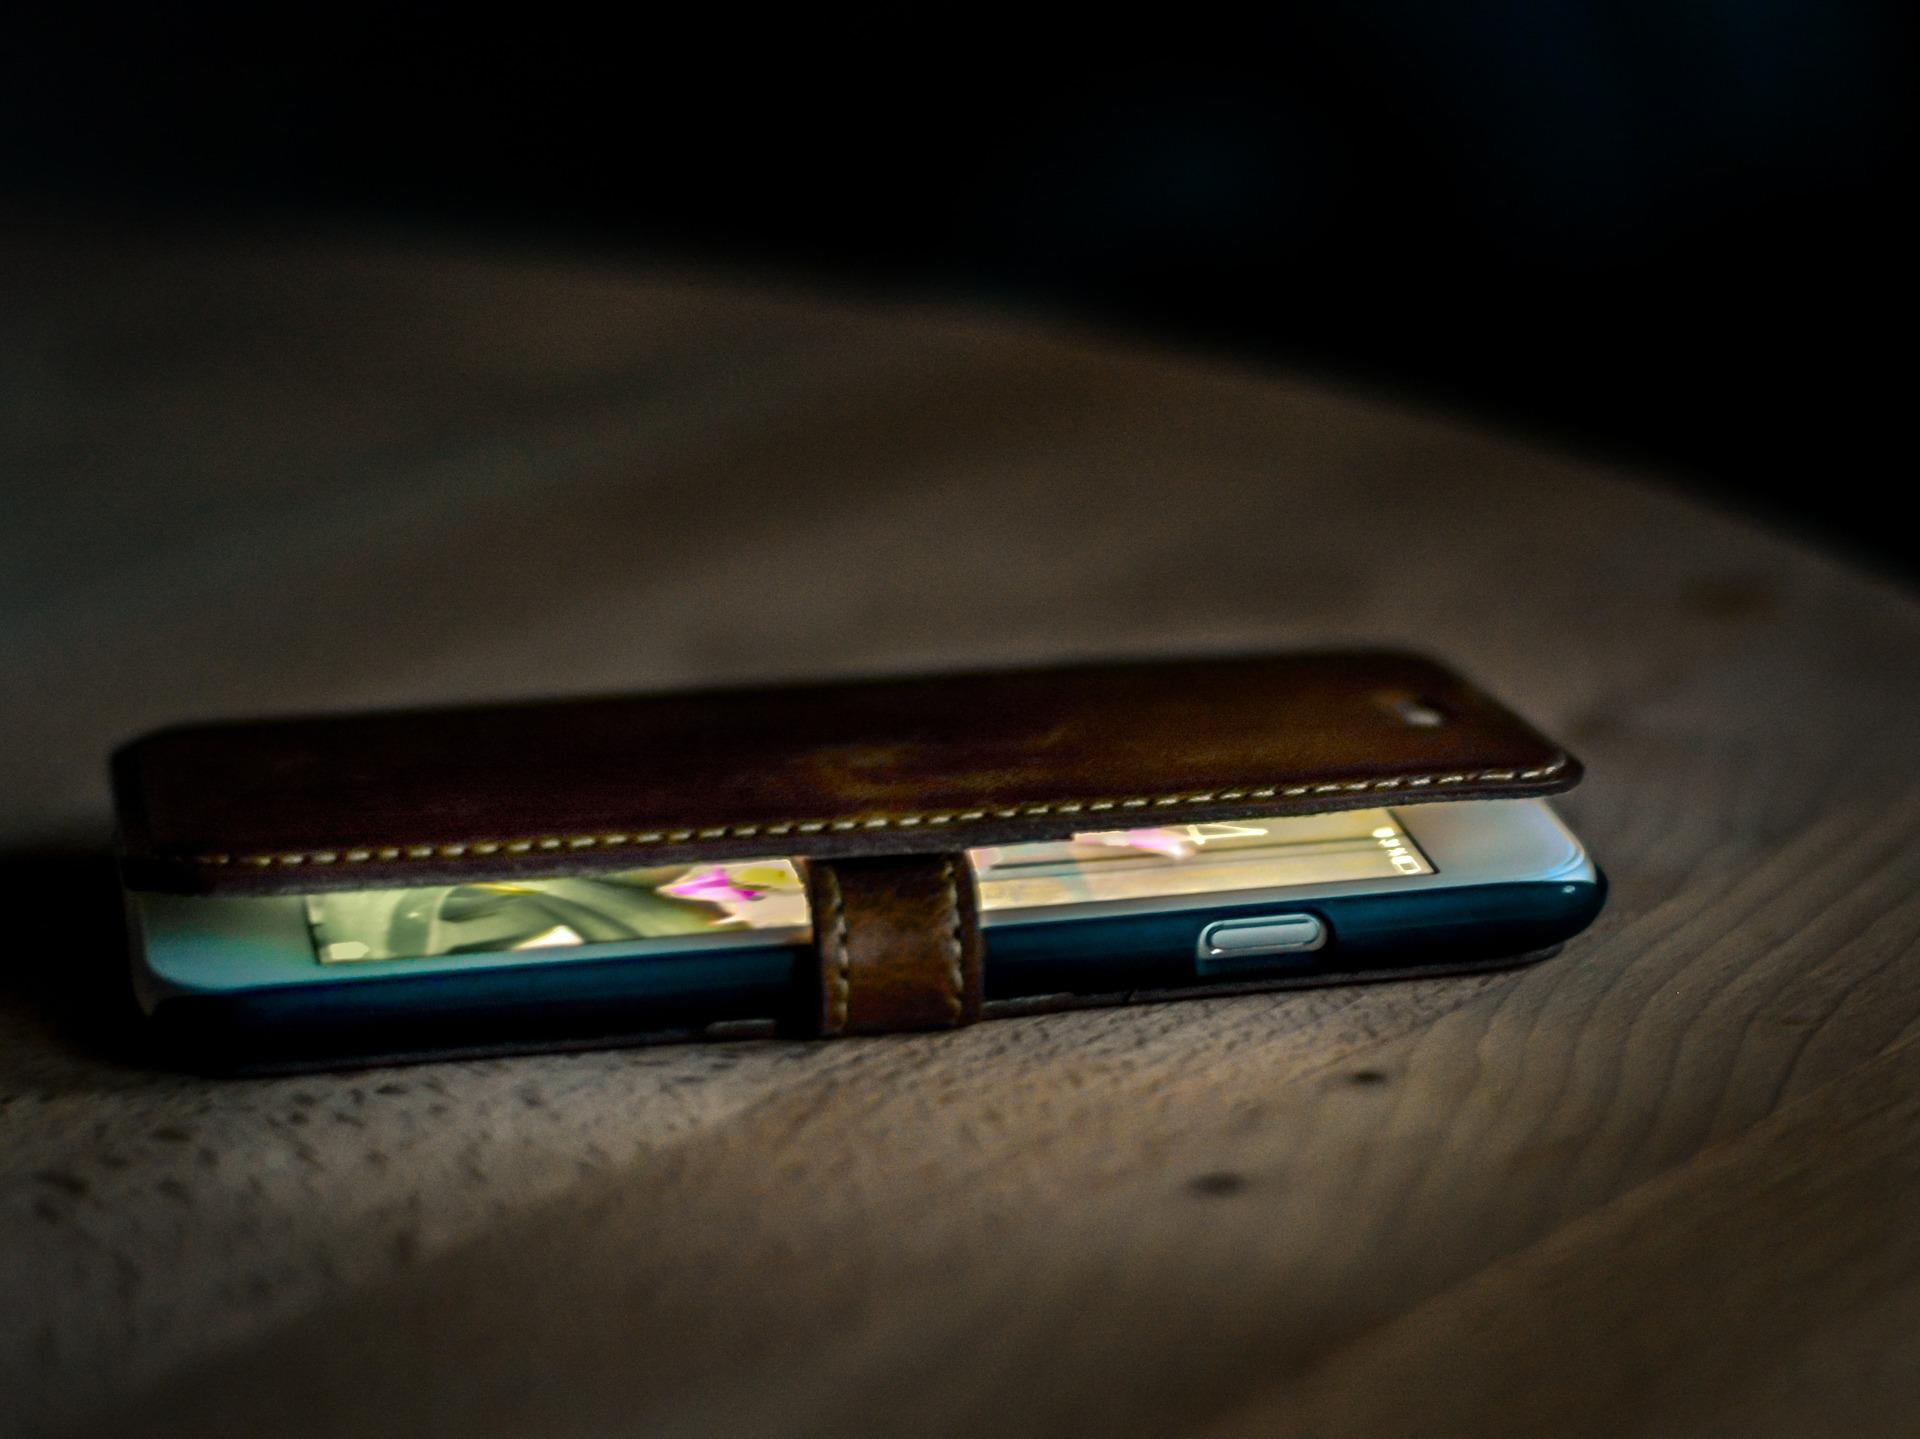 mobile-phone-630320_1920